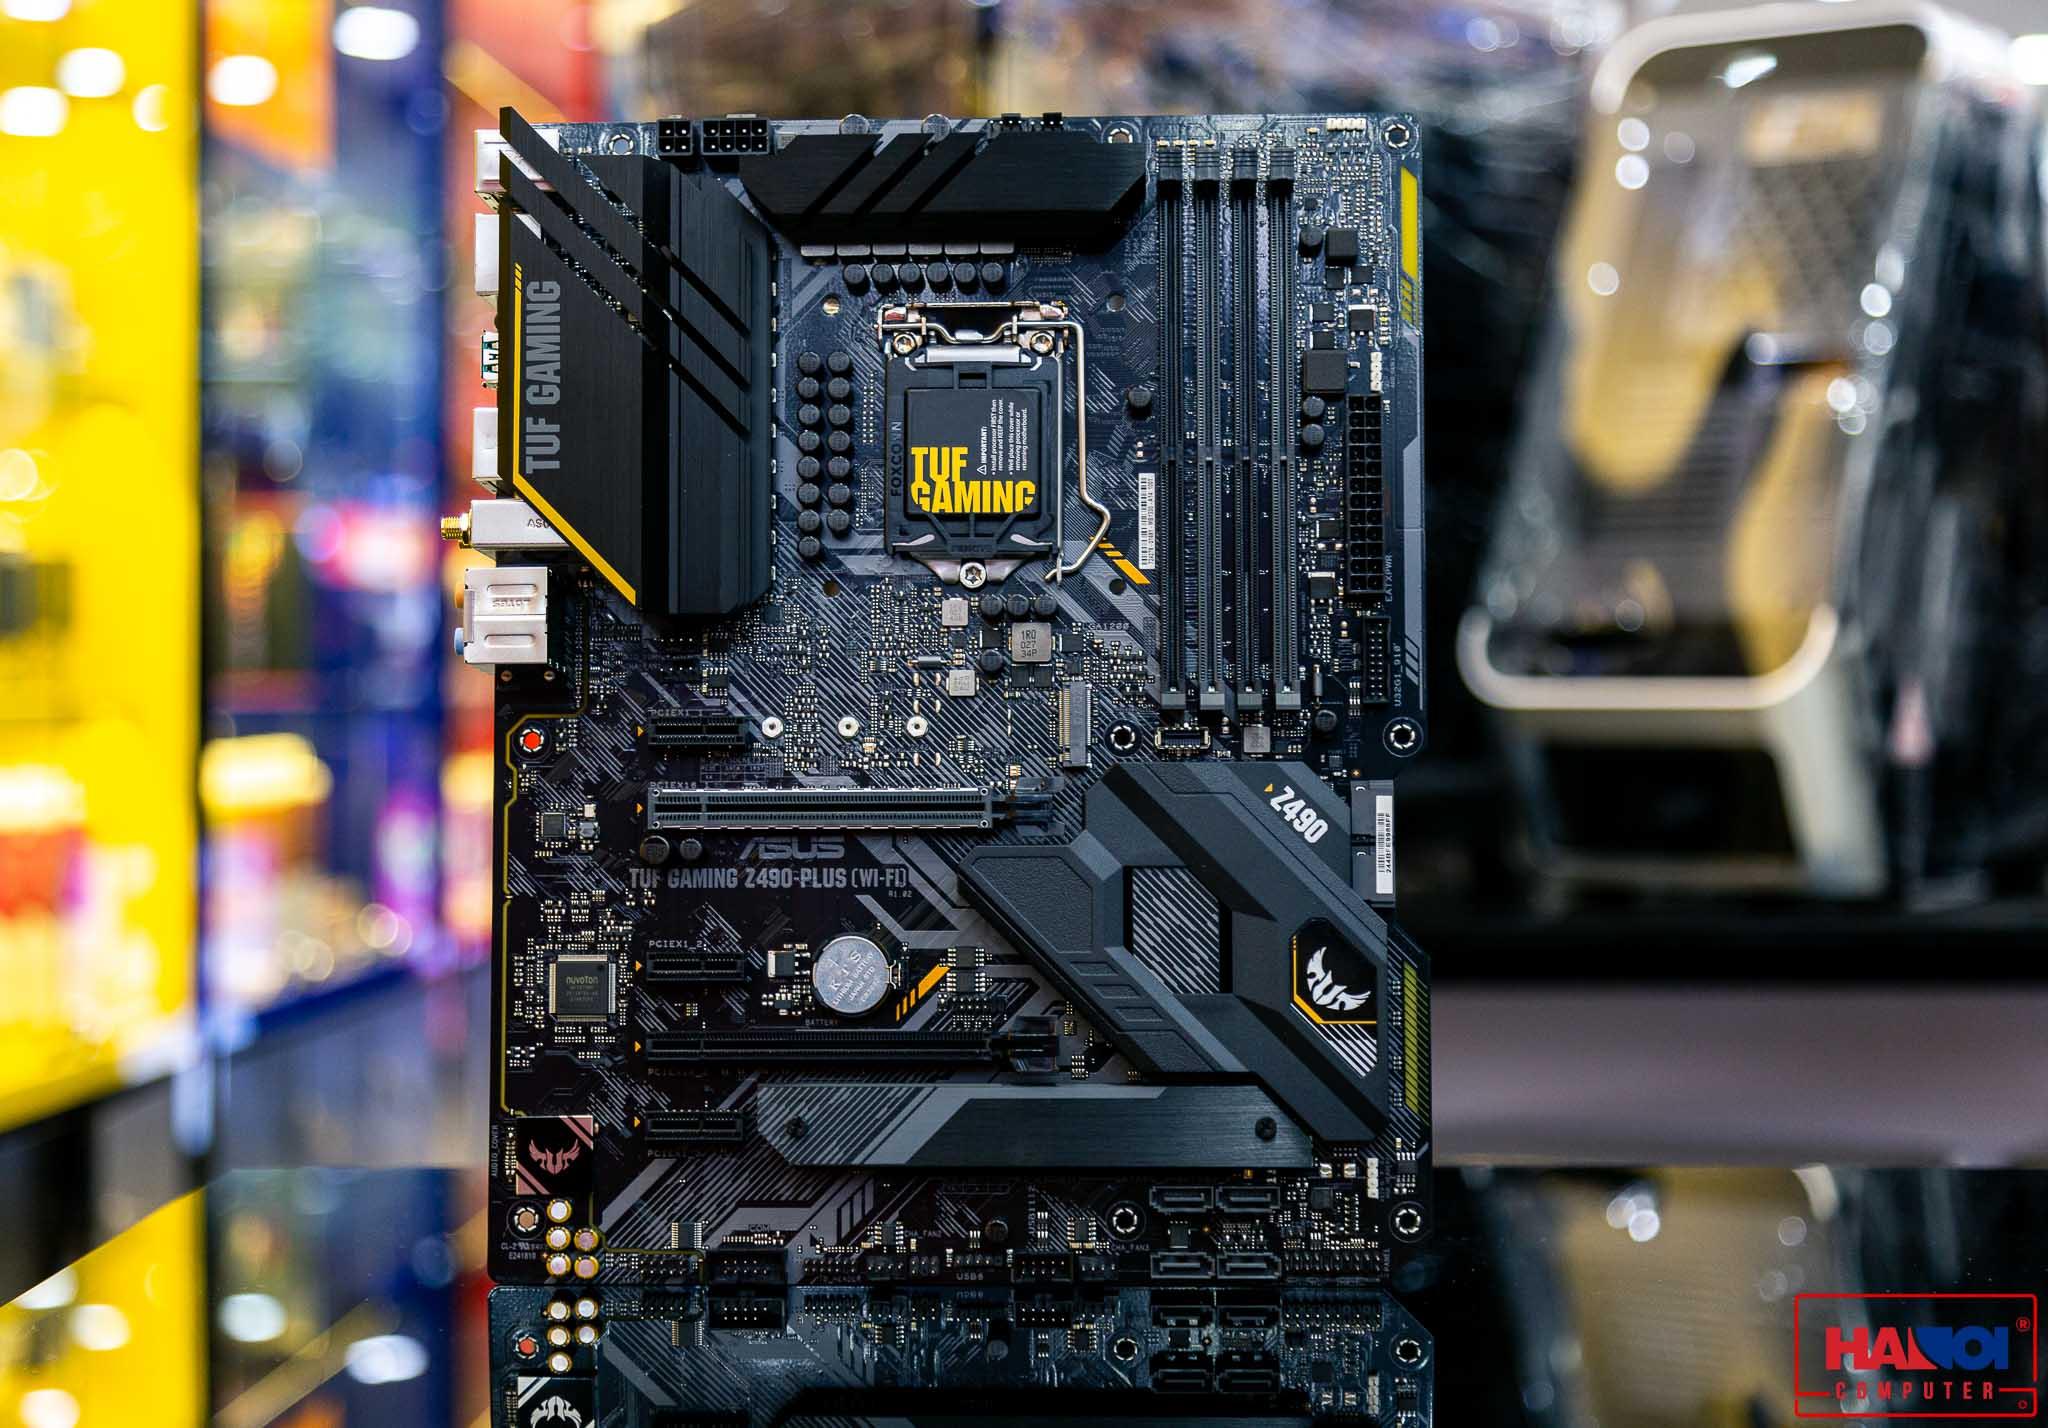 Mainboard ASUS TUF Gaming Z490-PLUS (WI-FI) (Intel Z490, Socket 1200, ATX, 4 khe RAM DDR4)